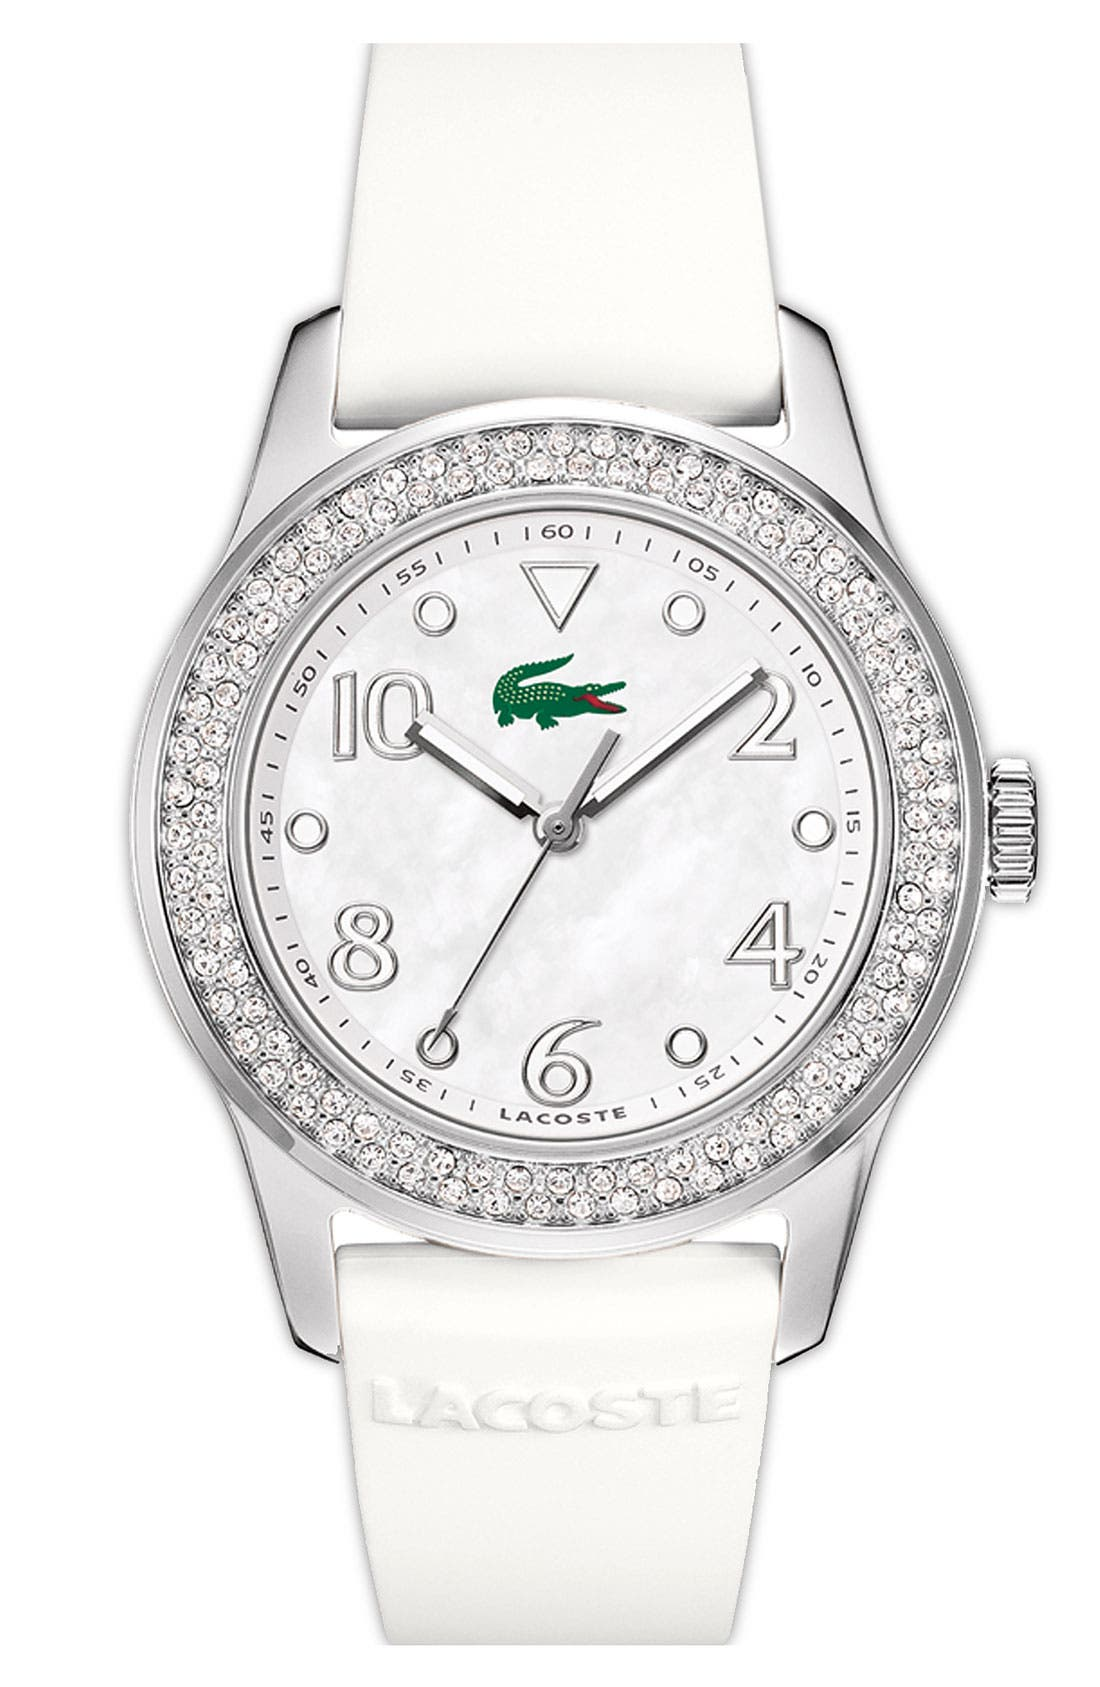 Main Image - Lacoste 'Advantage' Crystal Bezel Round Watch